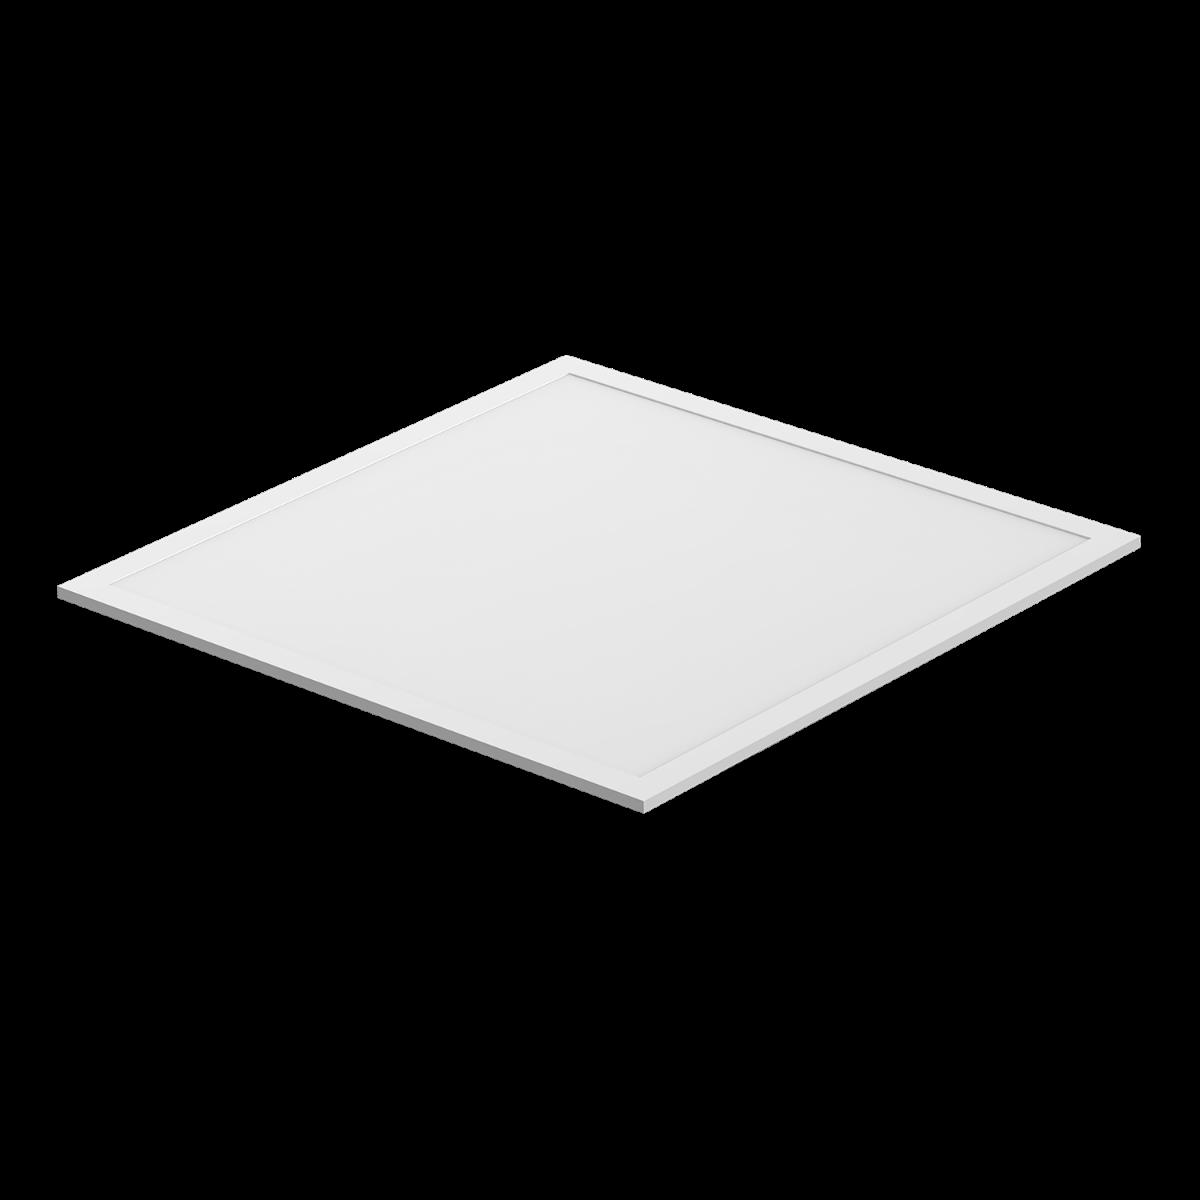 Noxion LED Paneeli Econox 32W 60x60cm 3000K 3900lm UGR <22 | Lämmin Valkoinen - Korvaa 4x18W